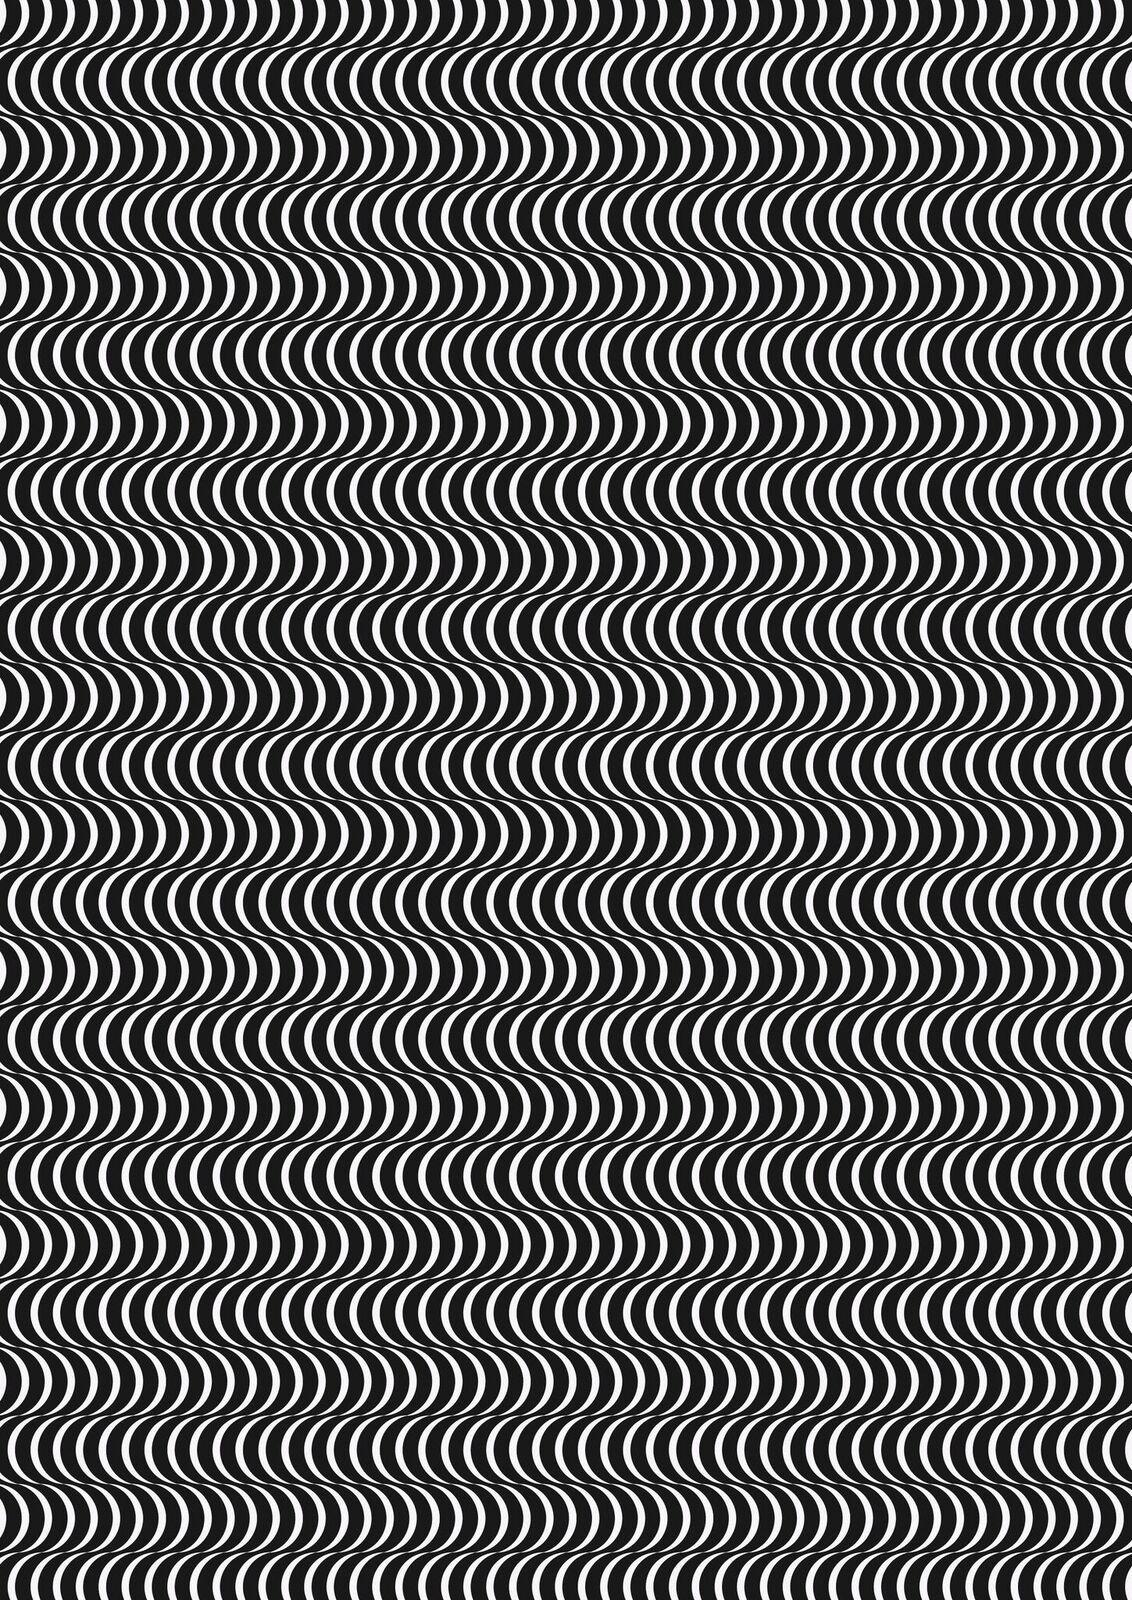 Lewis & Irene Geometrix - Black/White Scallops - GX3.1